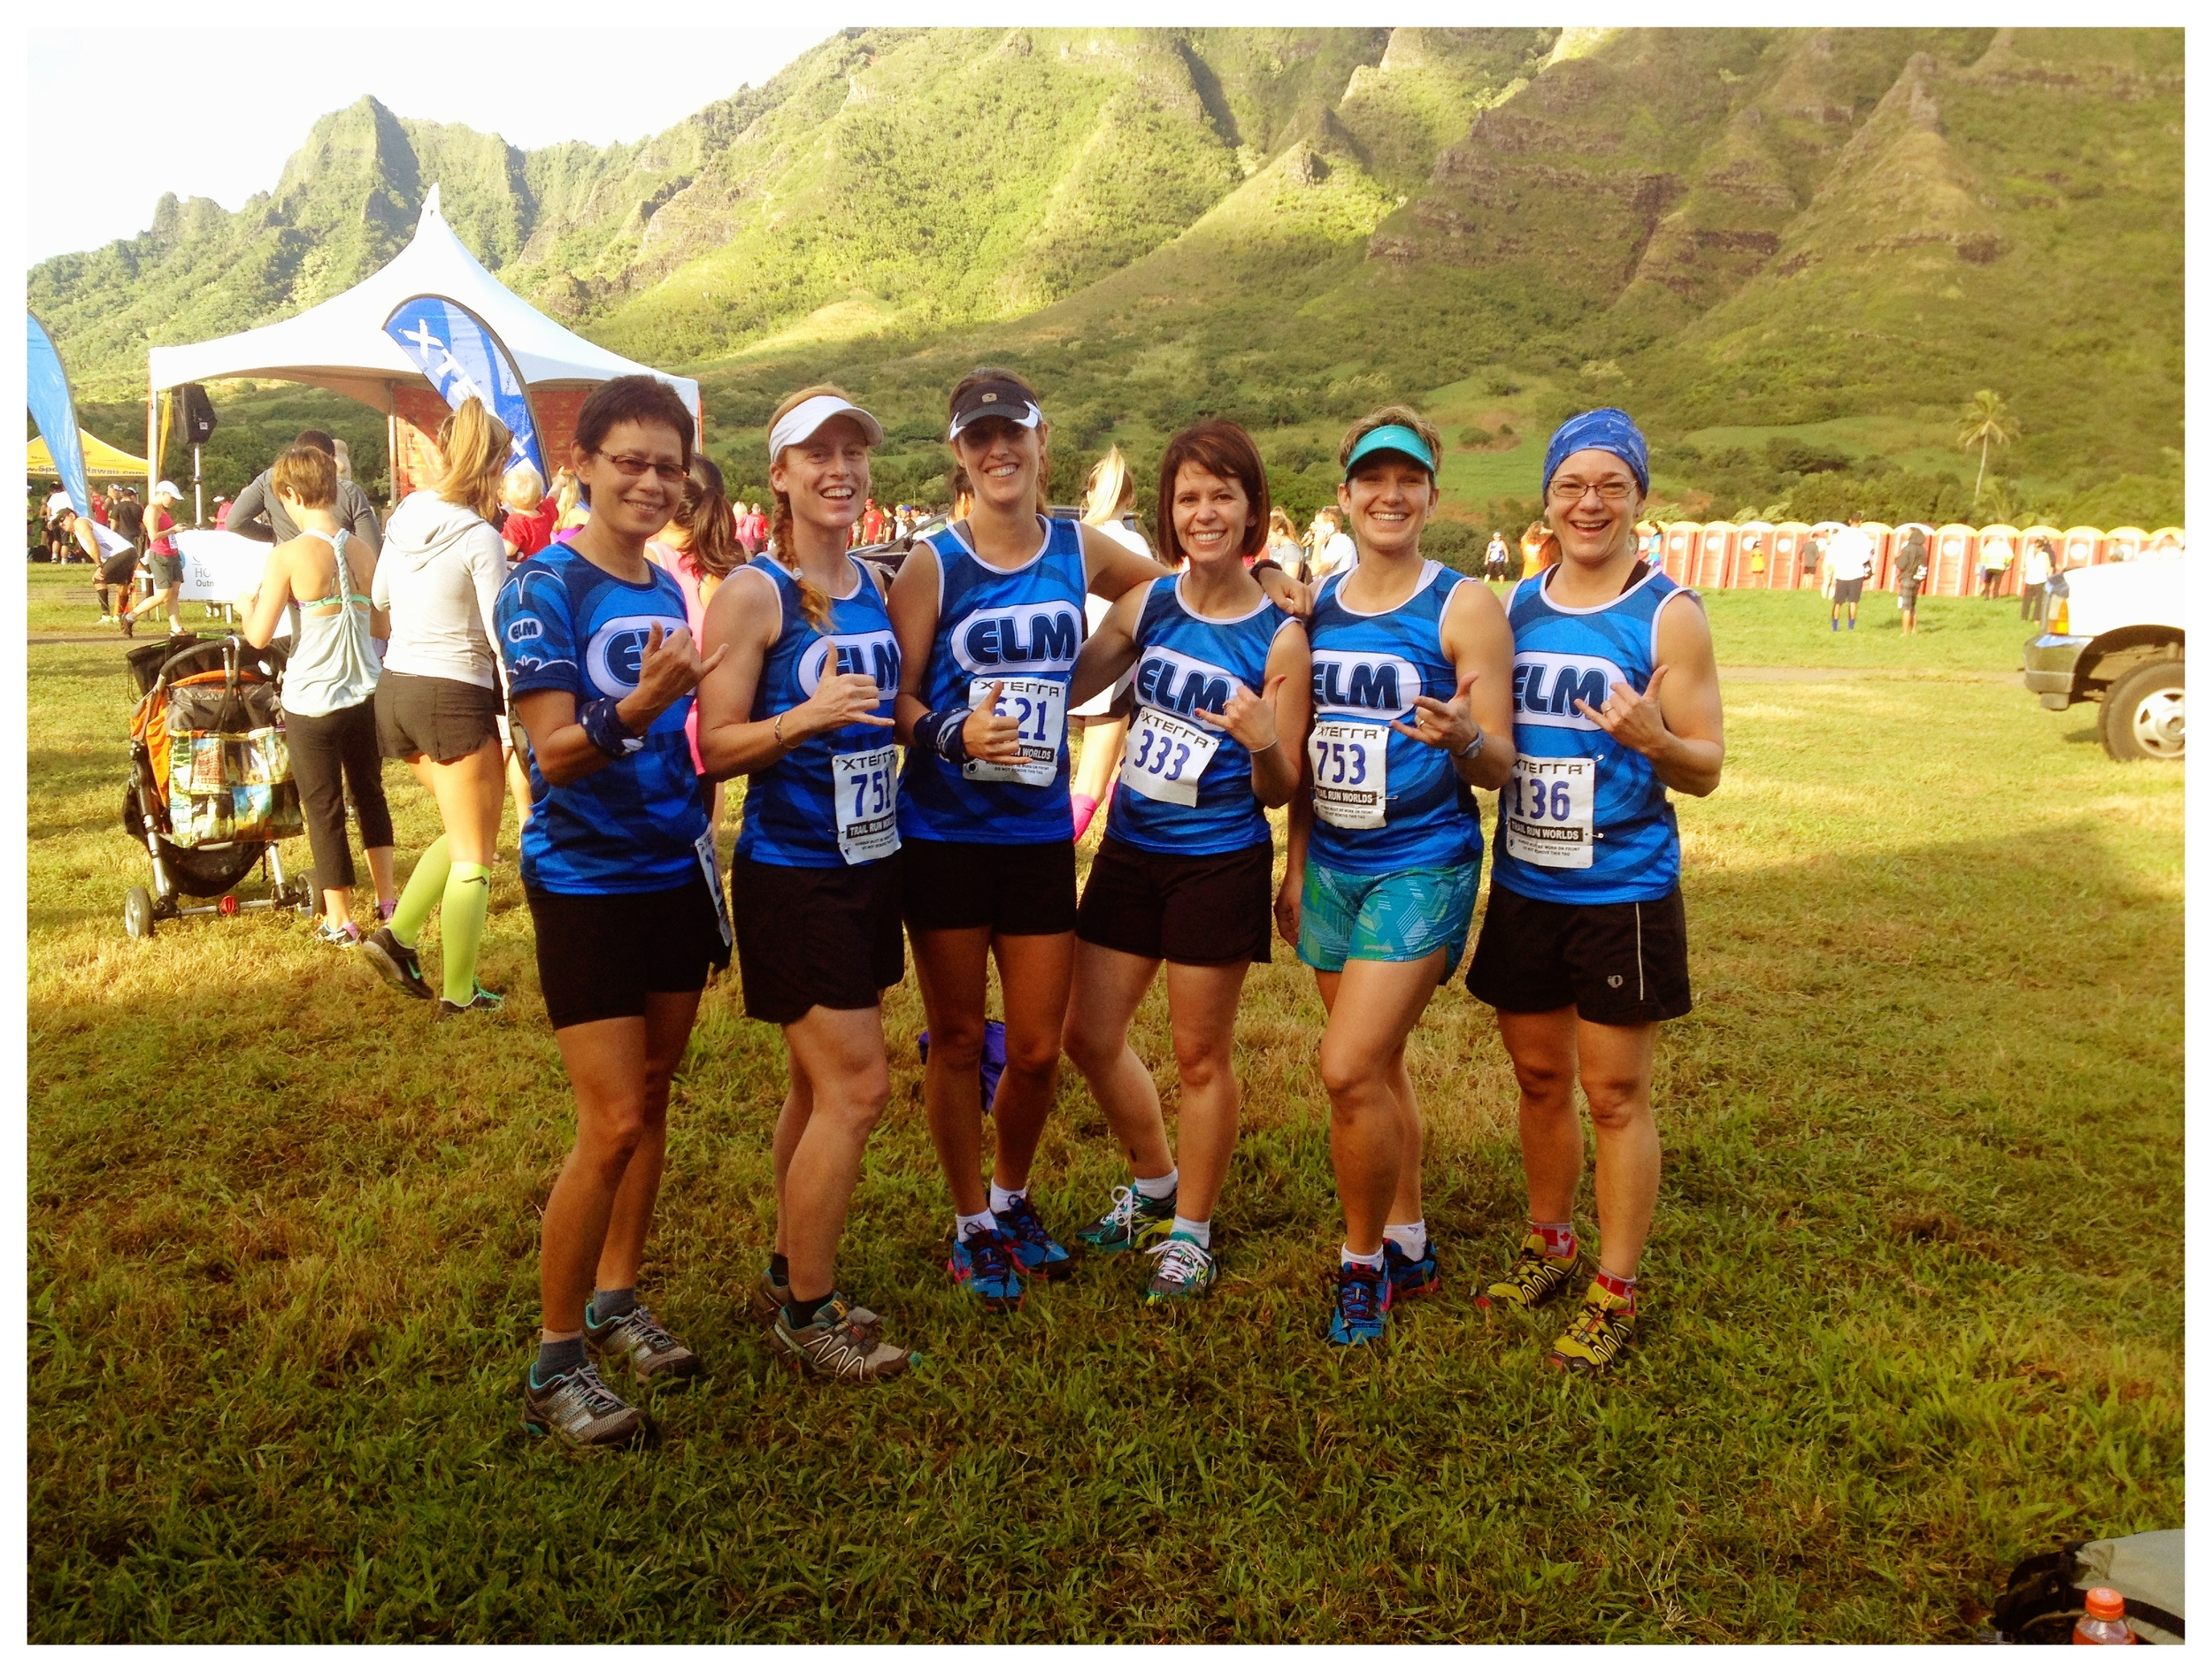 OAHU, HAWAII, XTERRA HALF MARATHON OFF-ROAD WORLD CHAMPTIONSHIPS: 2013 AND 2014